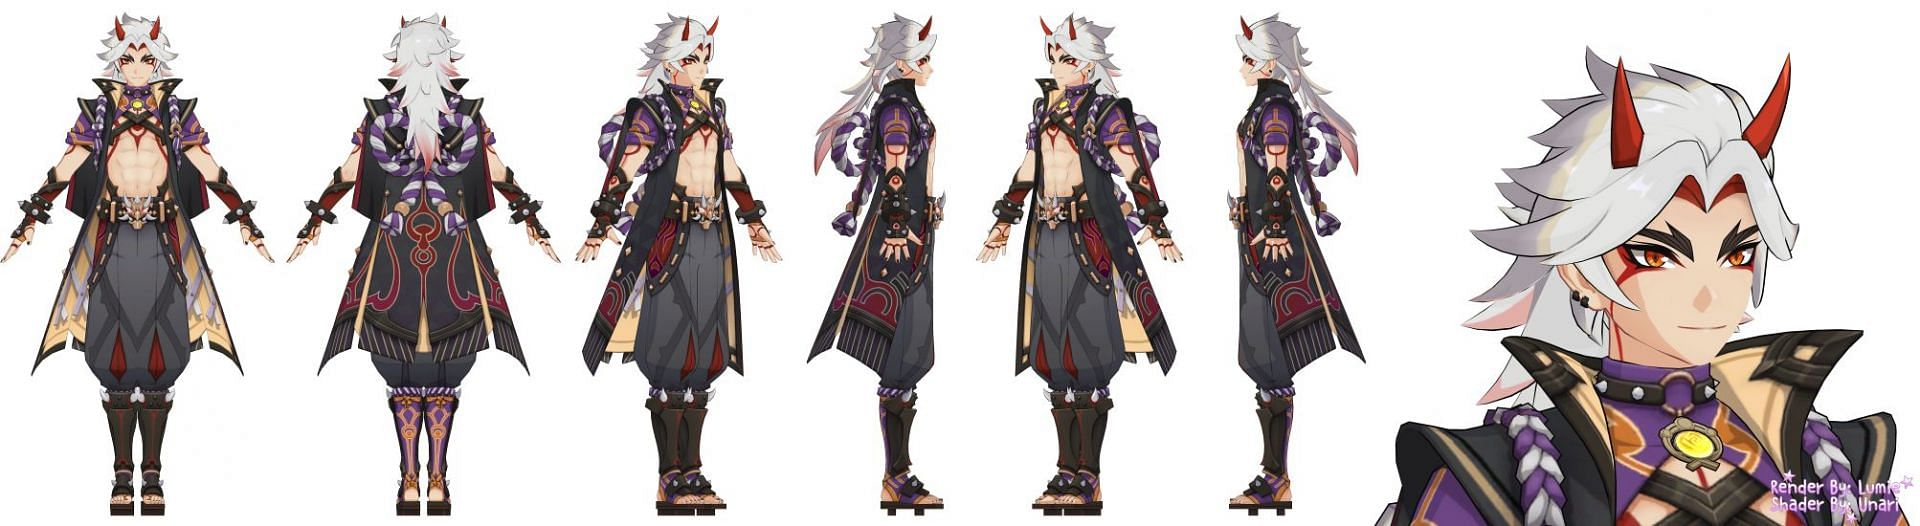 Itto's character model (Image via lumie_lumie)